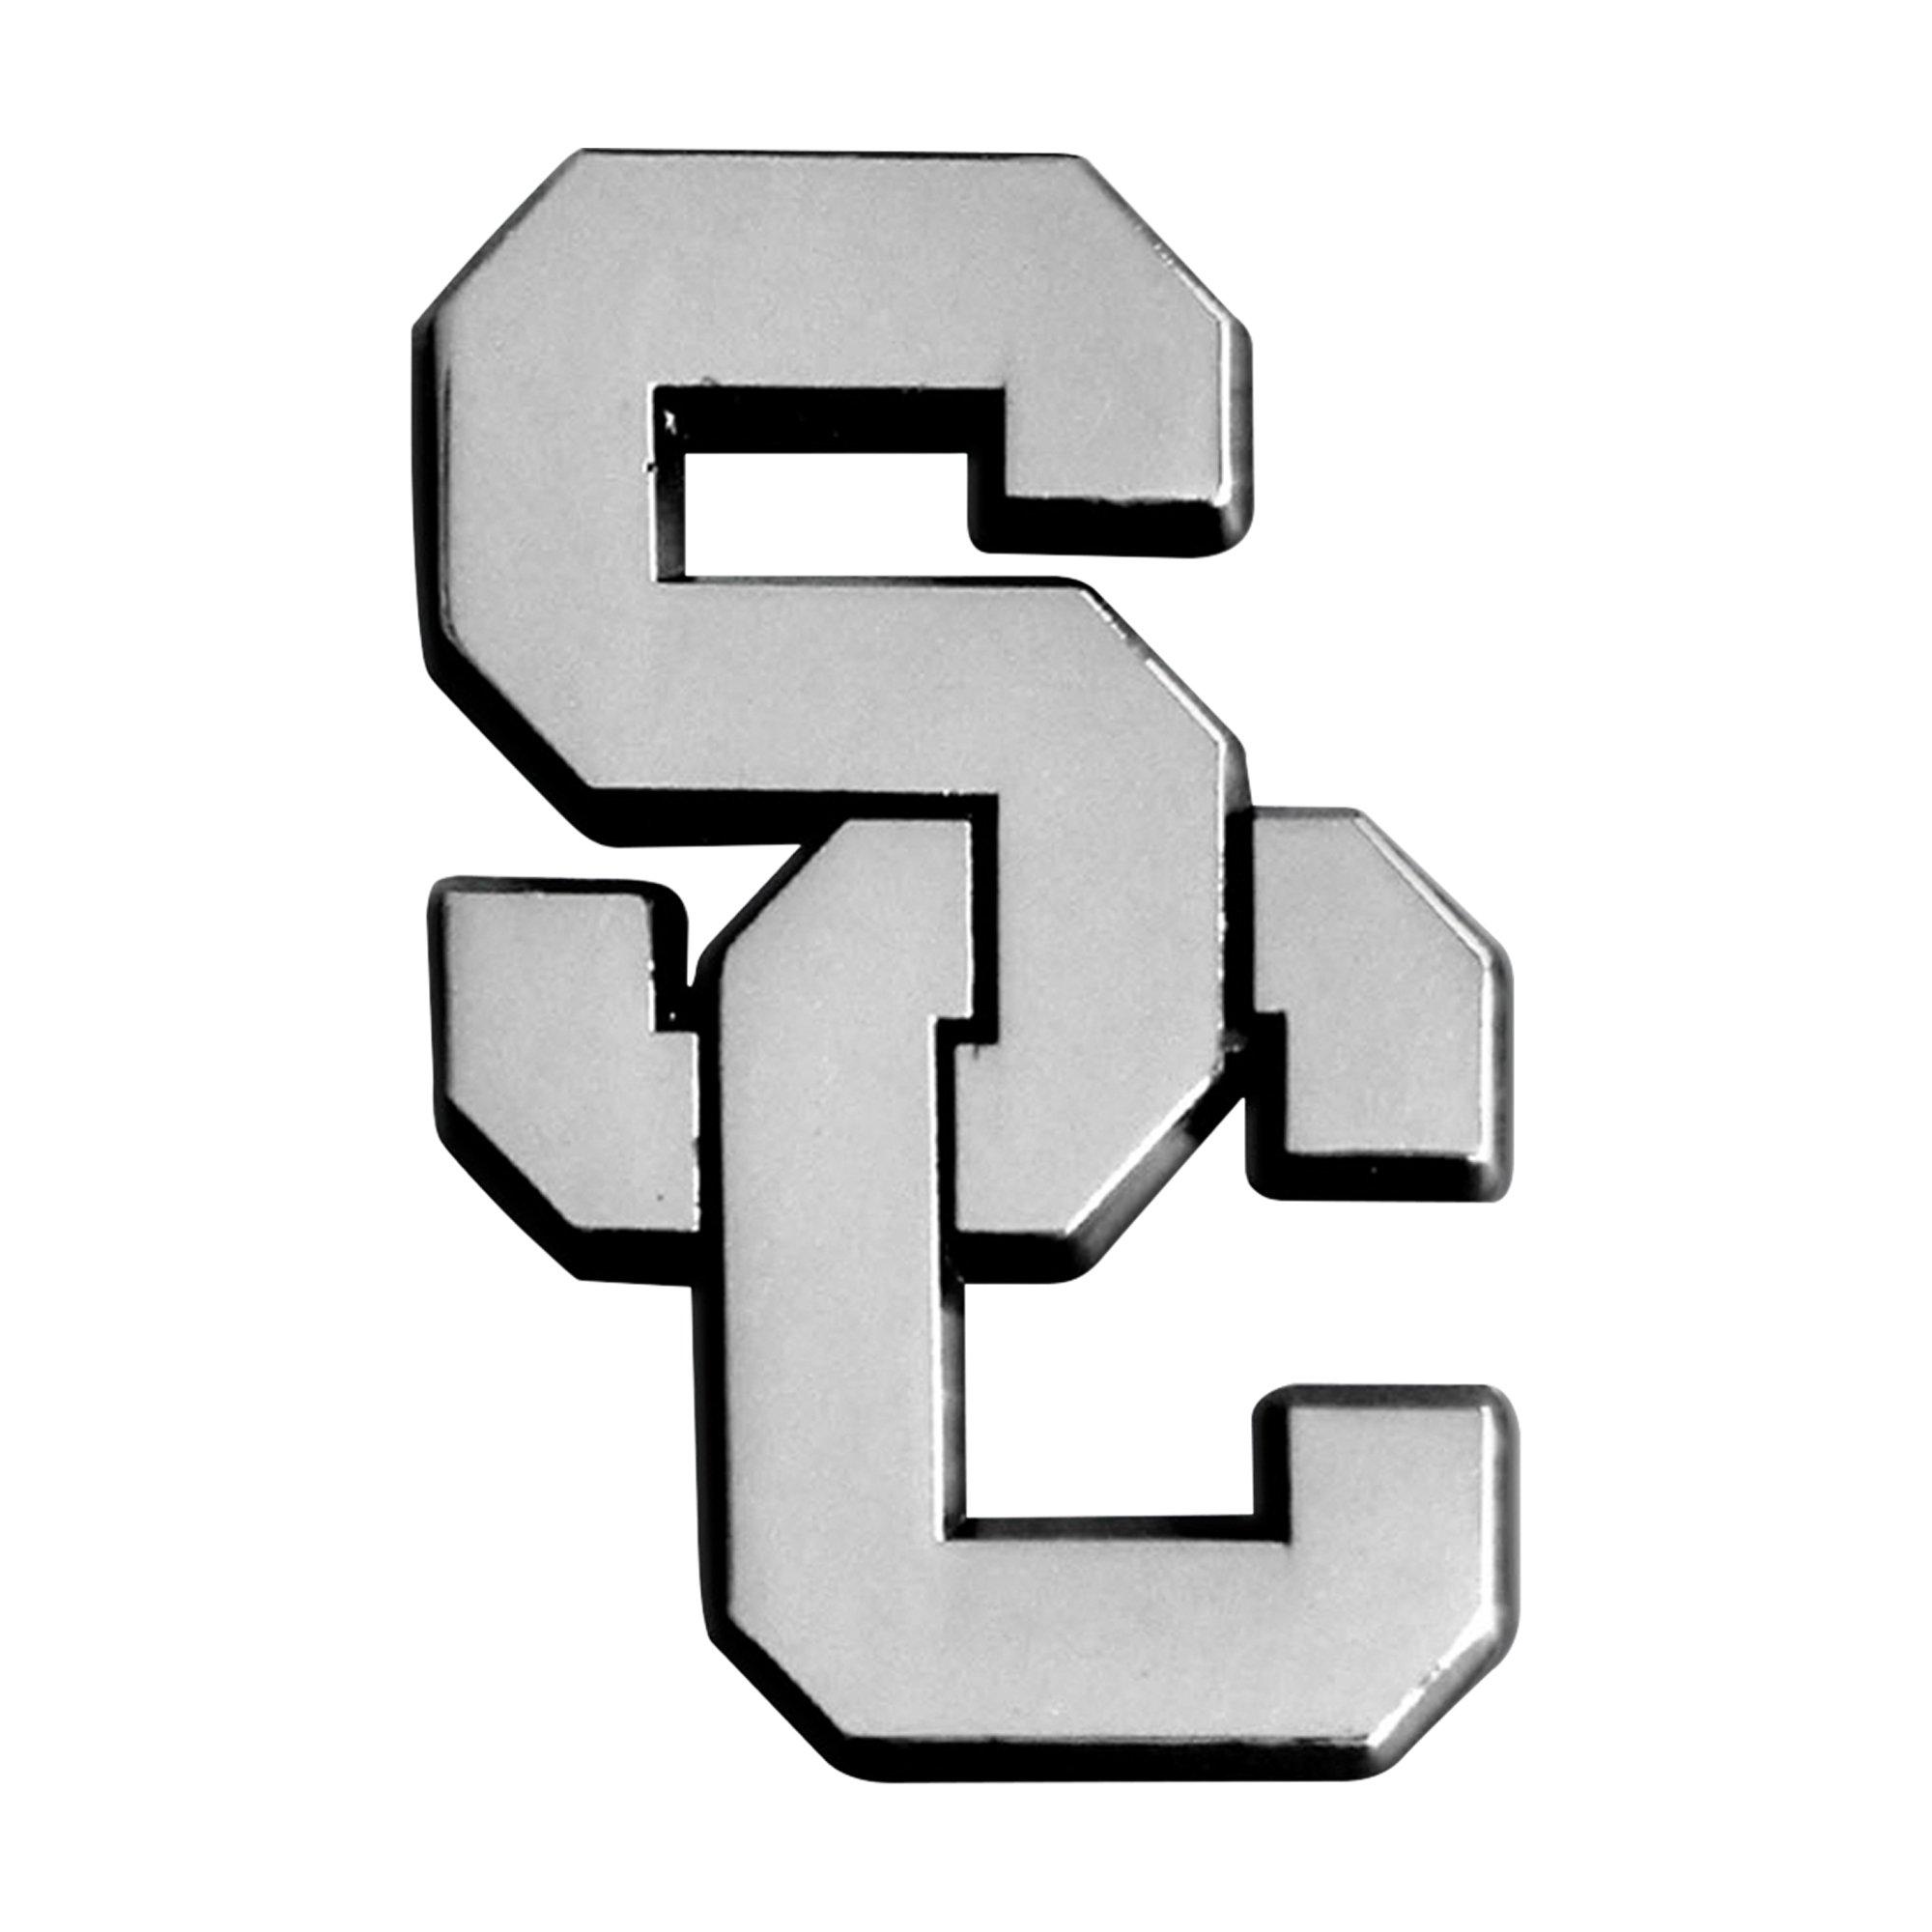 FANMATS NCAA Univ of Southern California Trojans Chrome Team Emblem